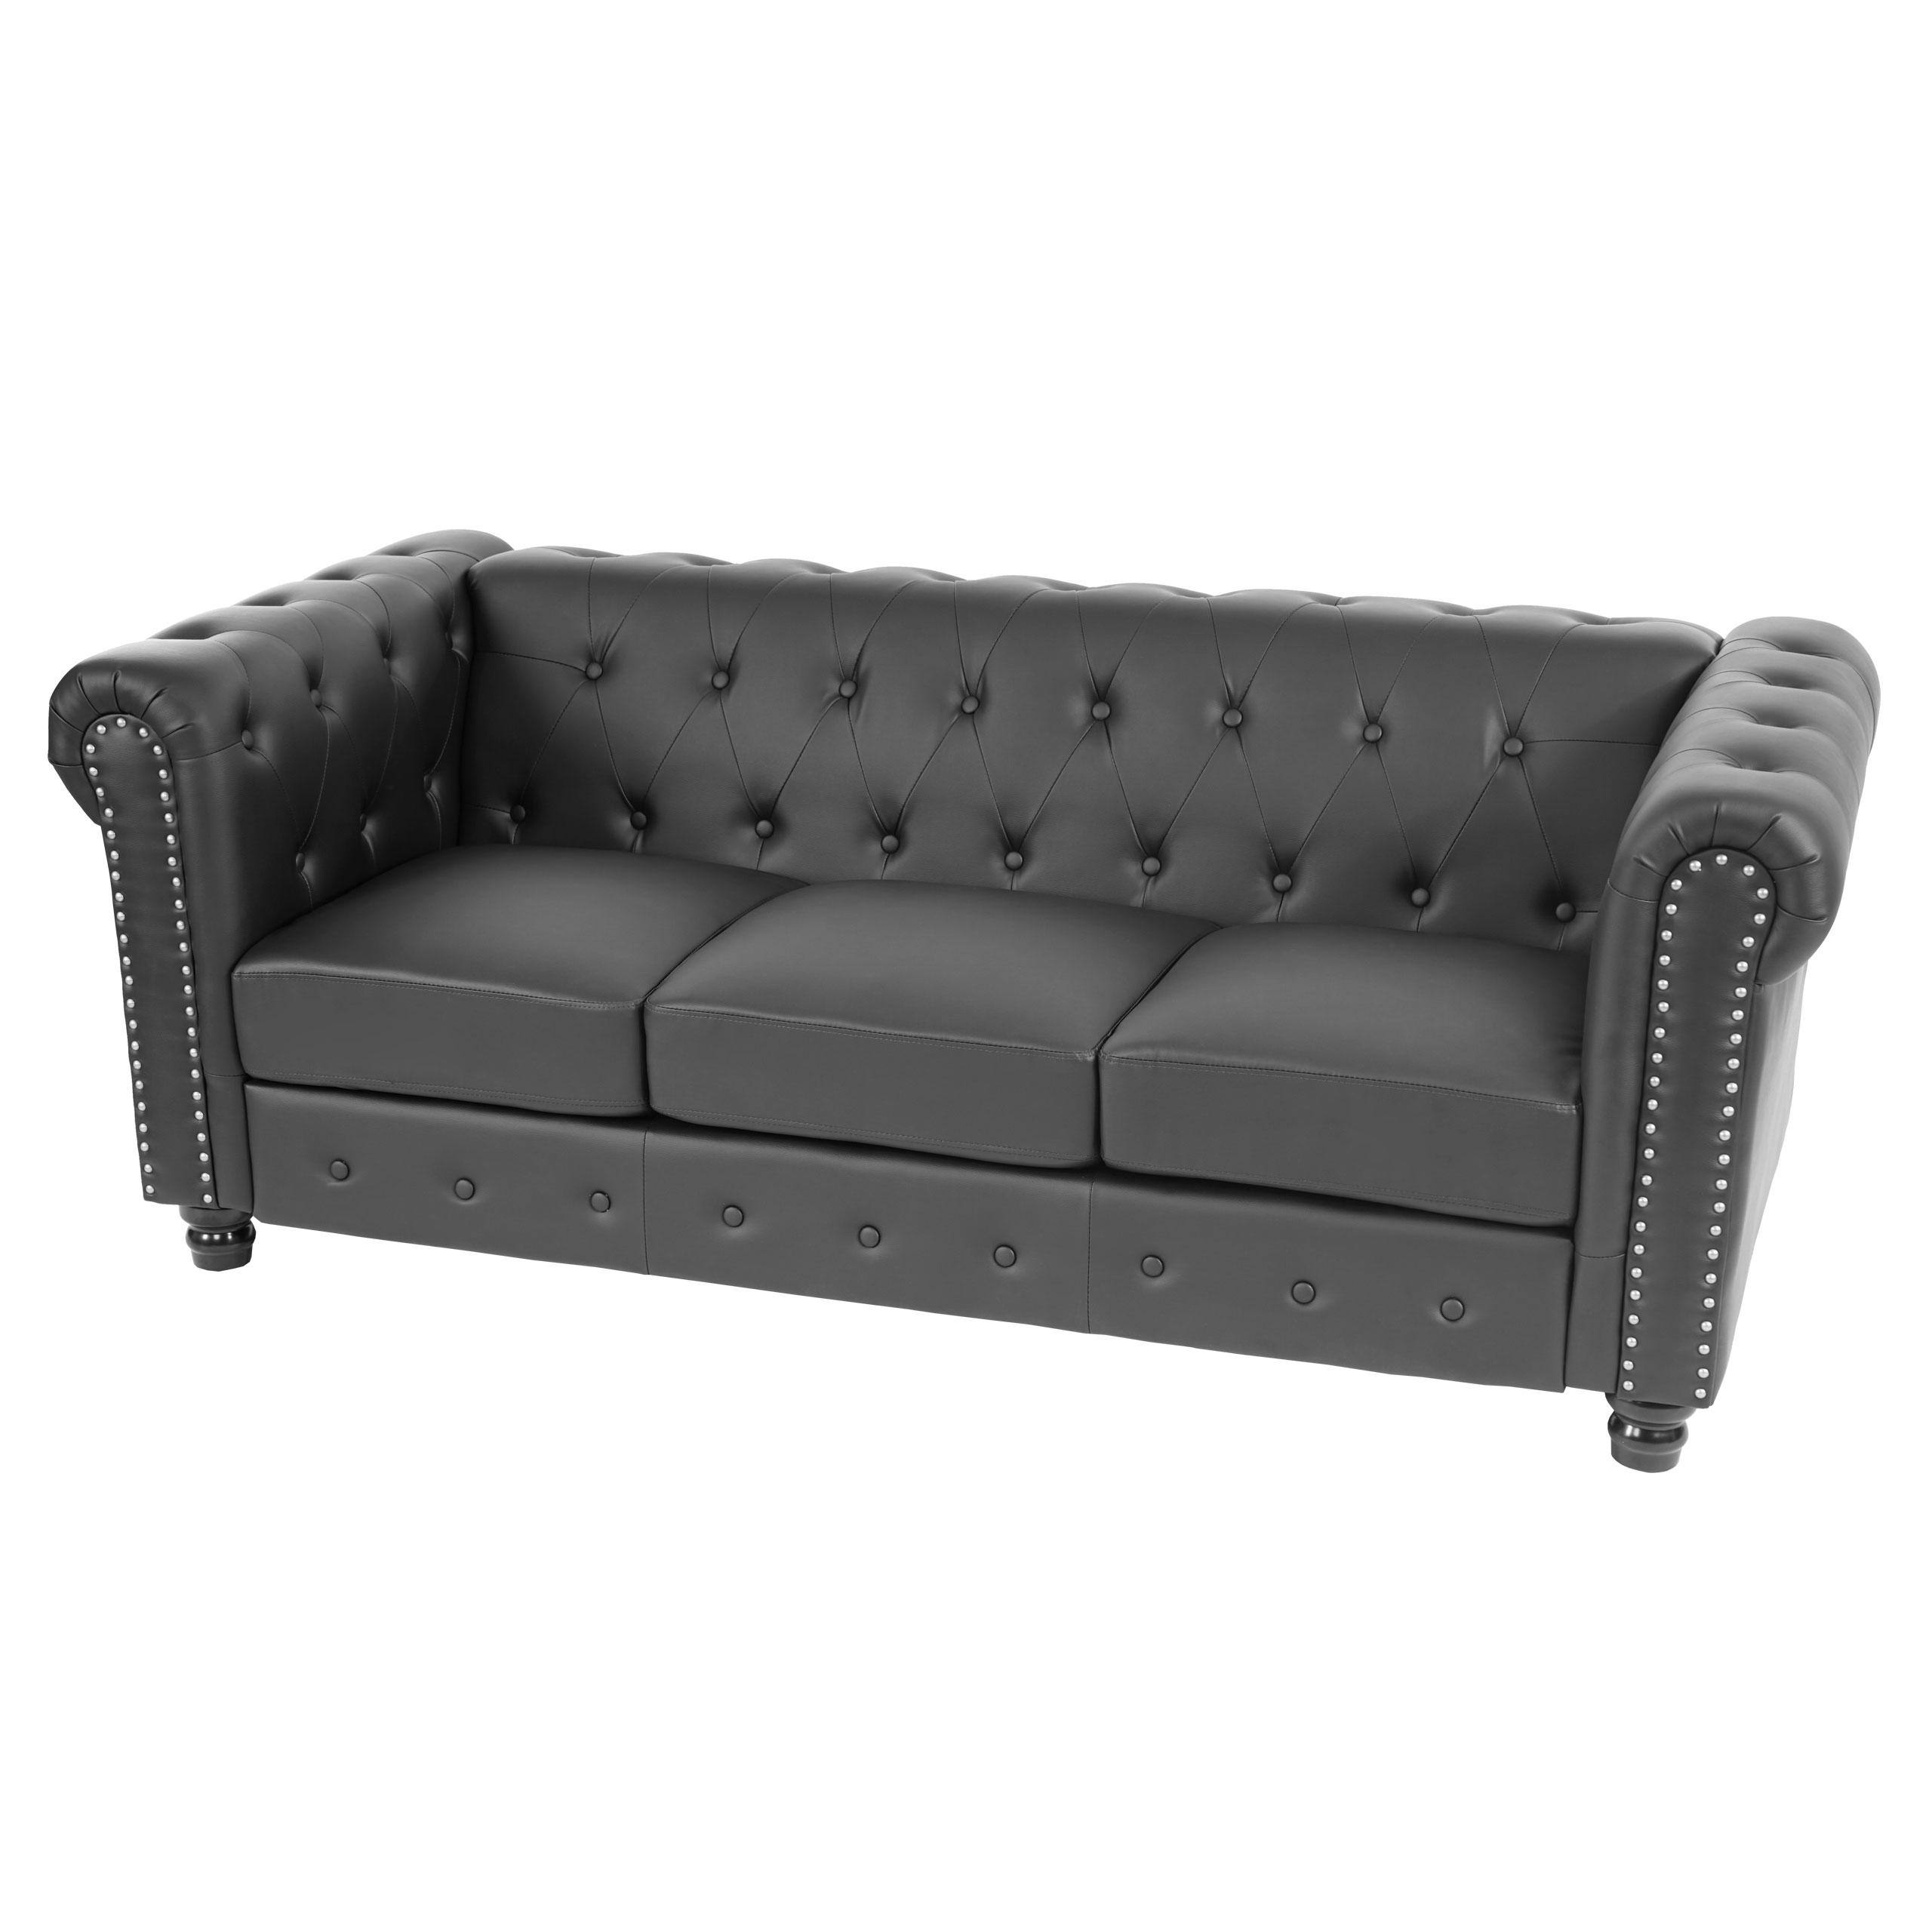 Luxus 3er Sofa Loungesofa Couch Chesterfield Kunstleder Runde F E Schwarz